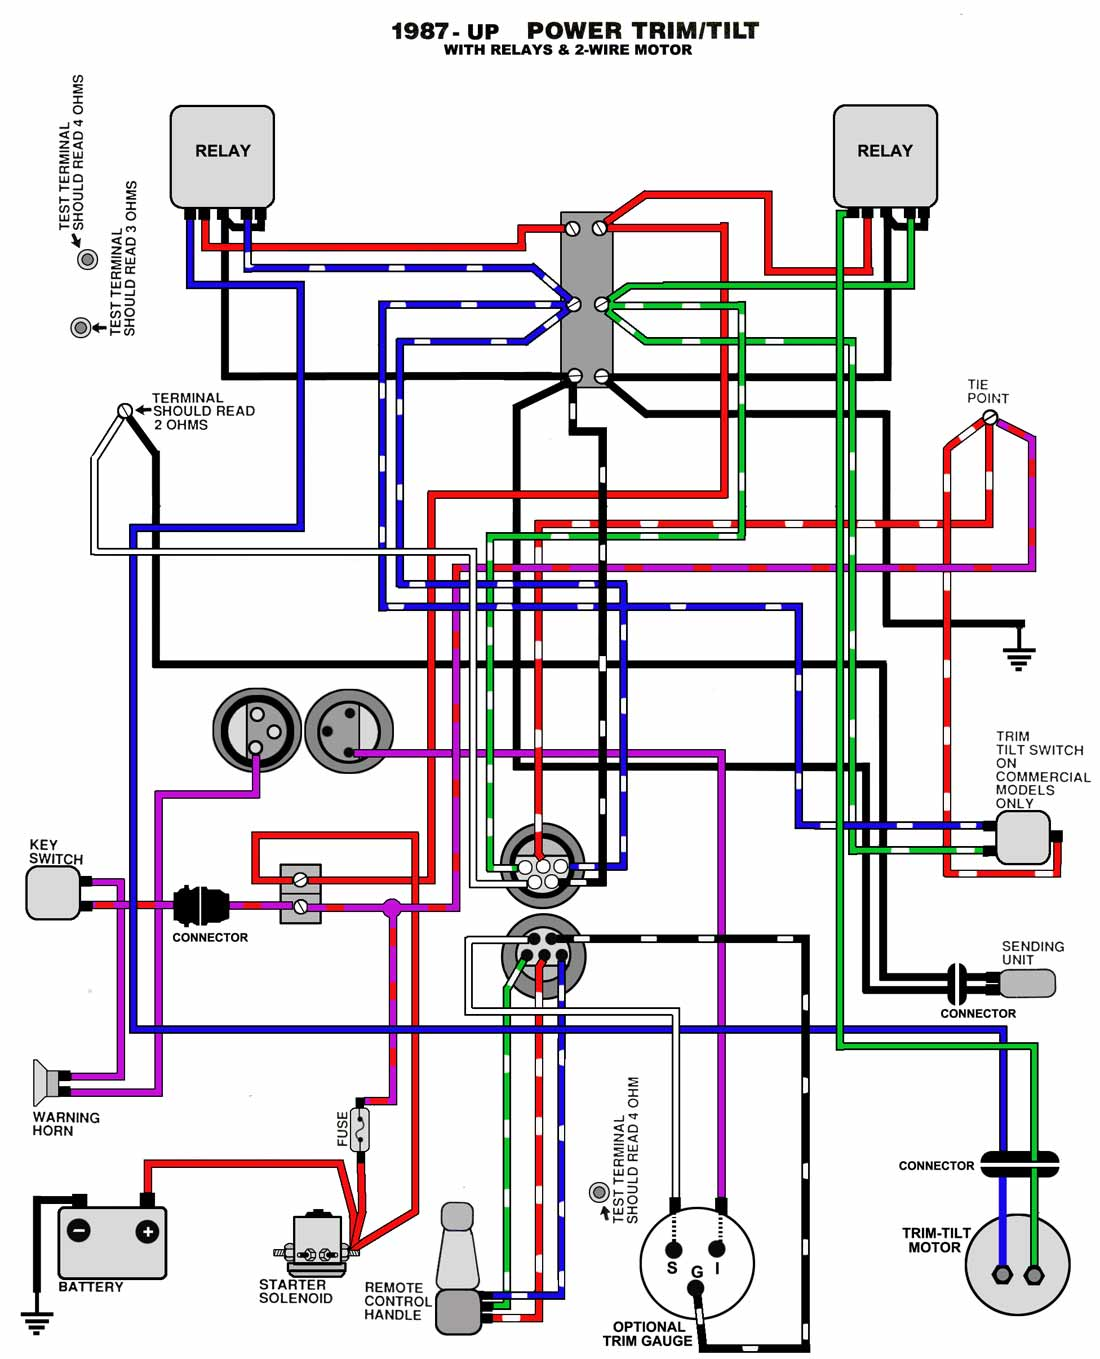 [ZTBE_9966]  DL_1820] Wiring Diagram For 140 Hp Johnson Outboard Motor Free Download  Download Diagram | Johnson 60 Wiring Schematic |  | Habi Dimet Onom Rdona Heeve Mohammedshrine Librar Wiring 101